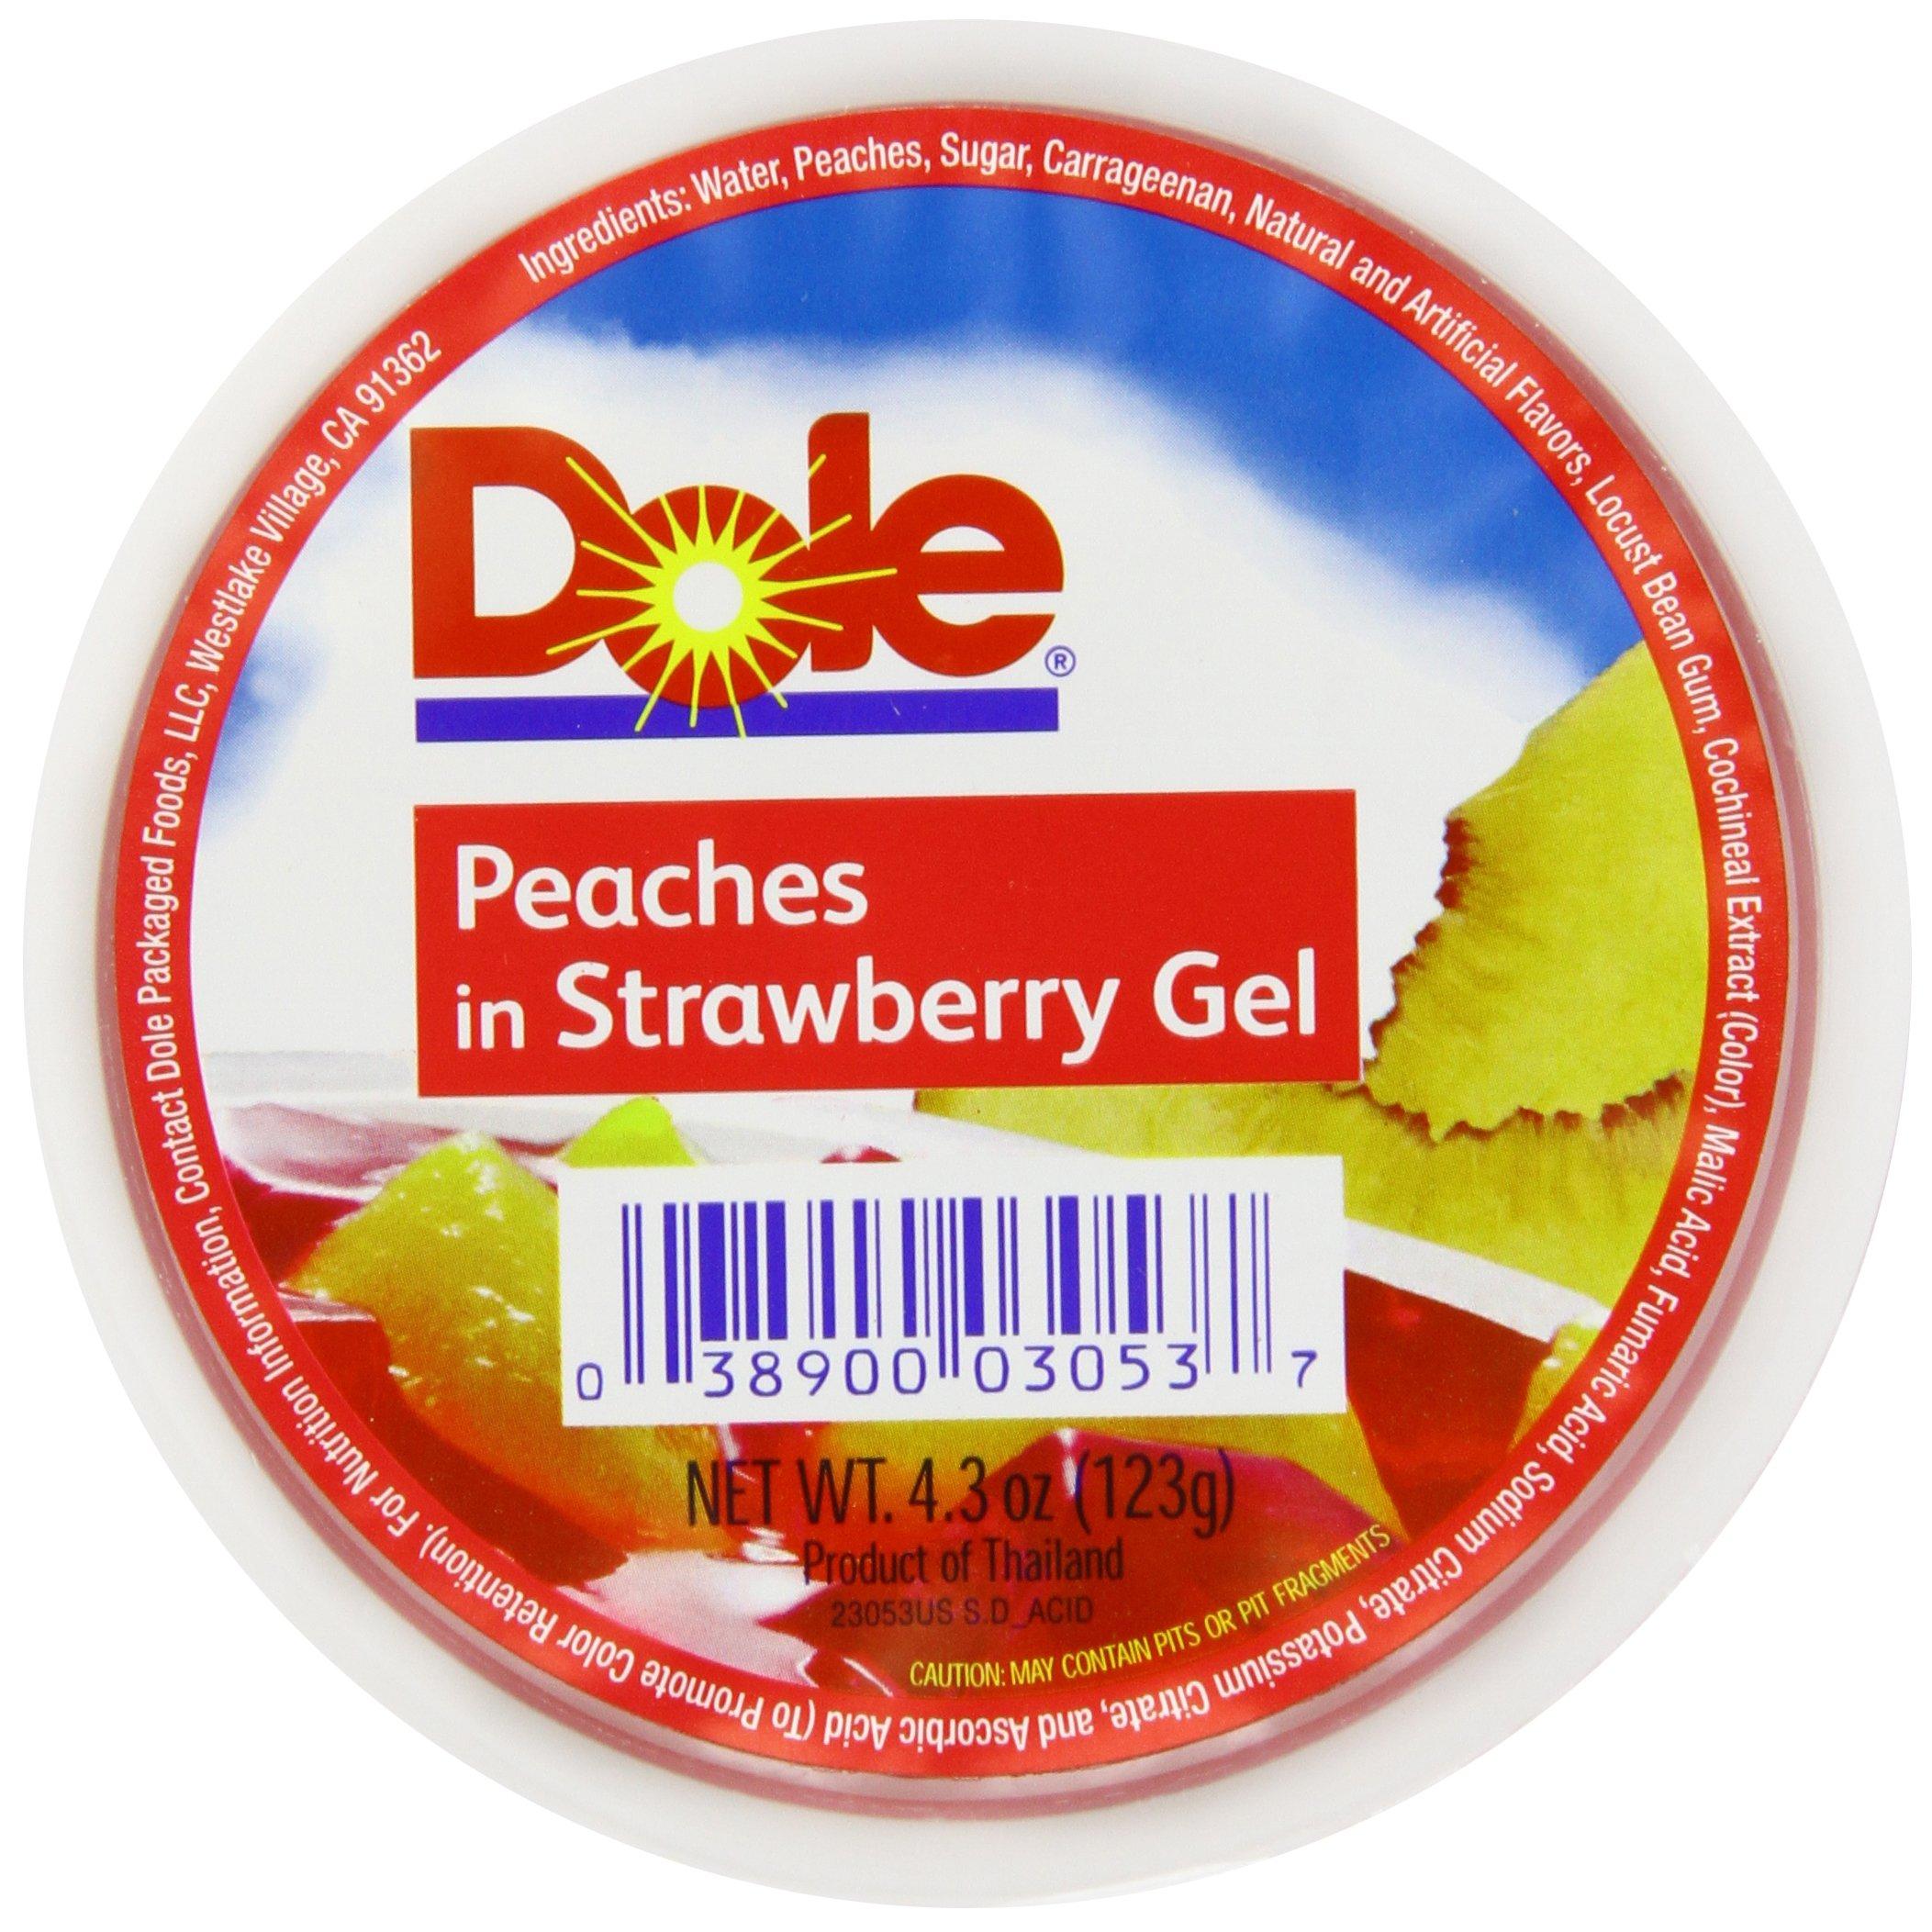 Dole Fruit Bowls, Peaches in Strawberry Gel, 4.3 Ounce (36 Cups), All Natural Diced Peaches in Strawberry-Flavored Gel, Non-GMO Gluten-Free Fat-Free